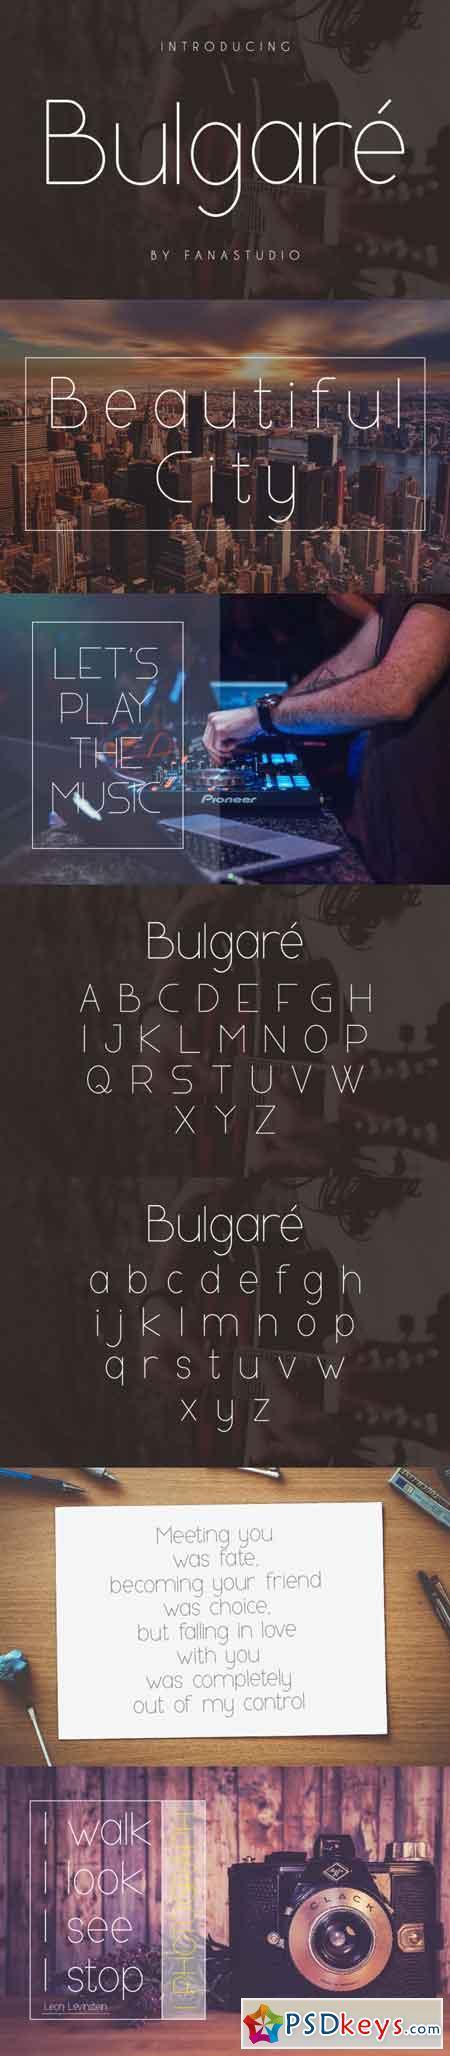 Bulgare 3522127